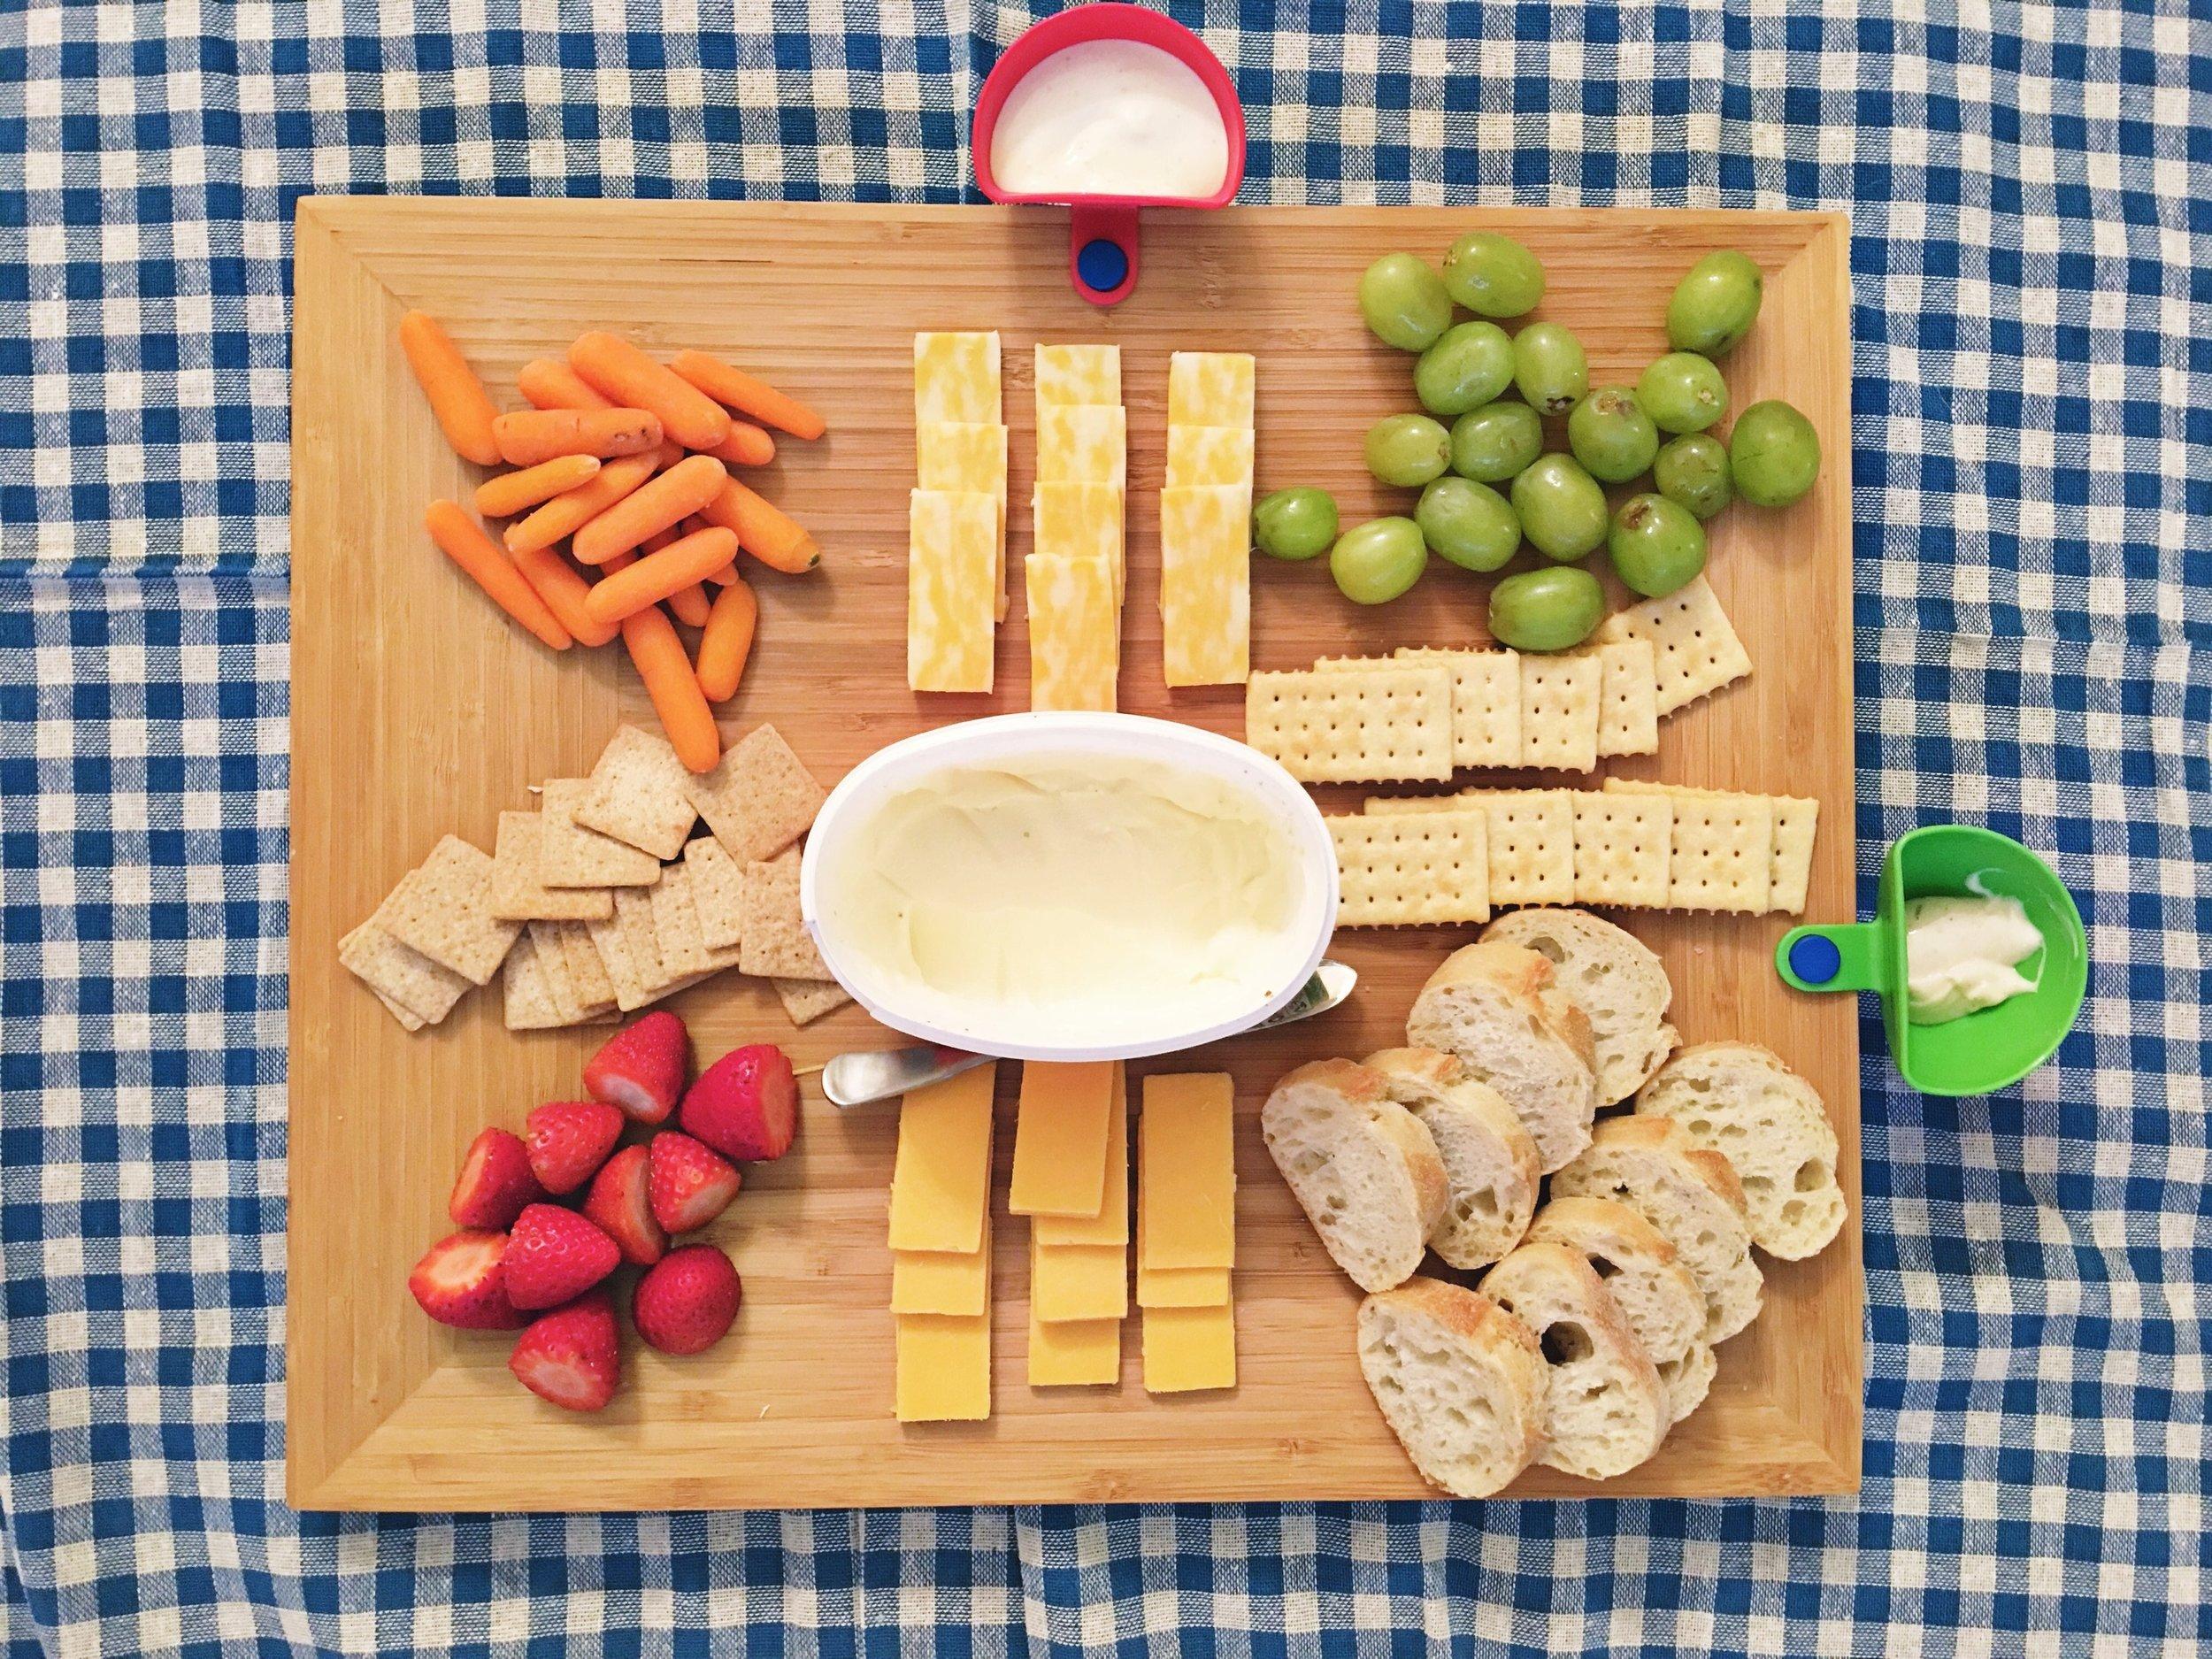 picnic style dinner